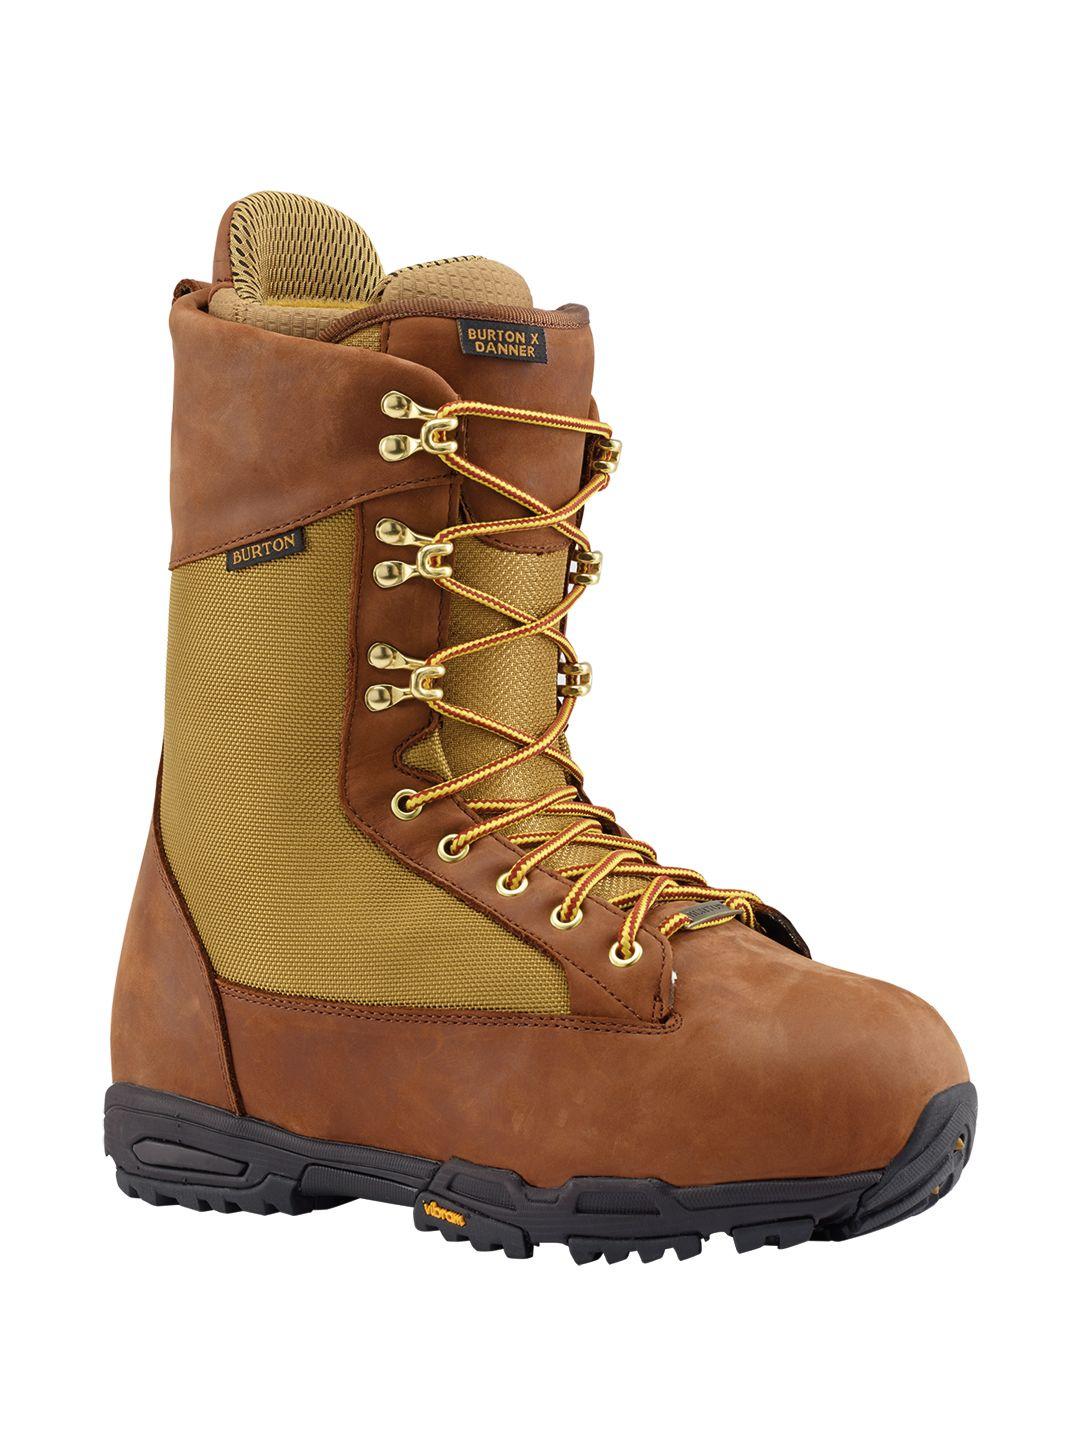 Burton x danner boot x7ffiw